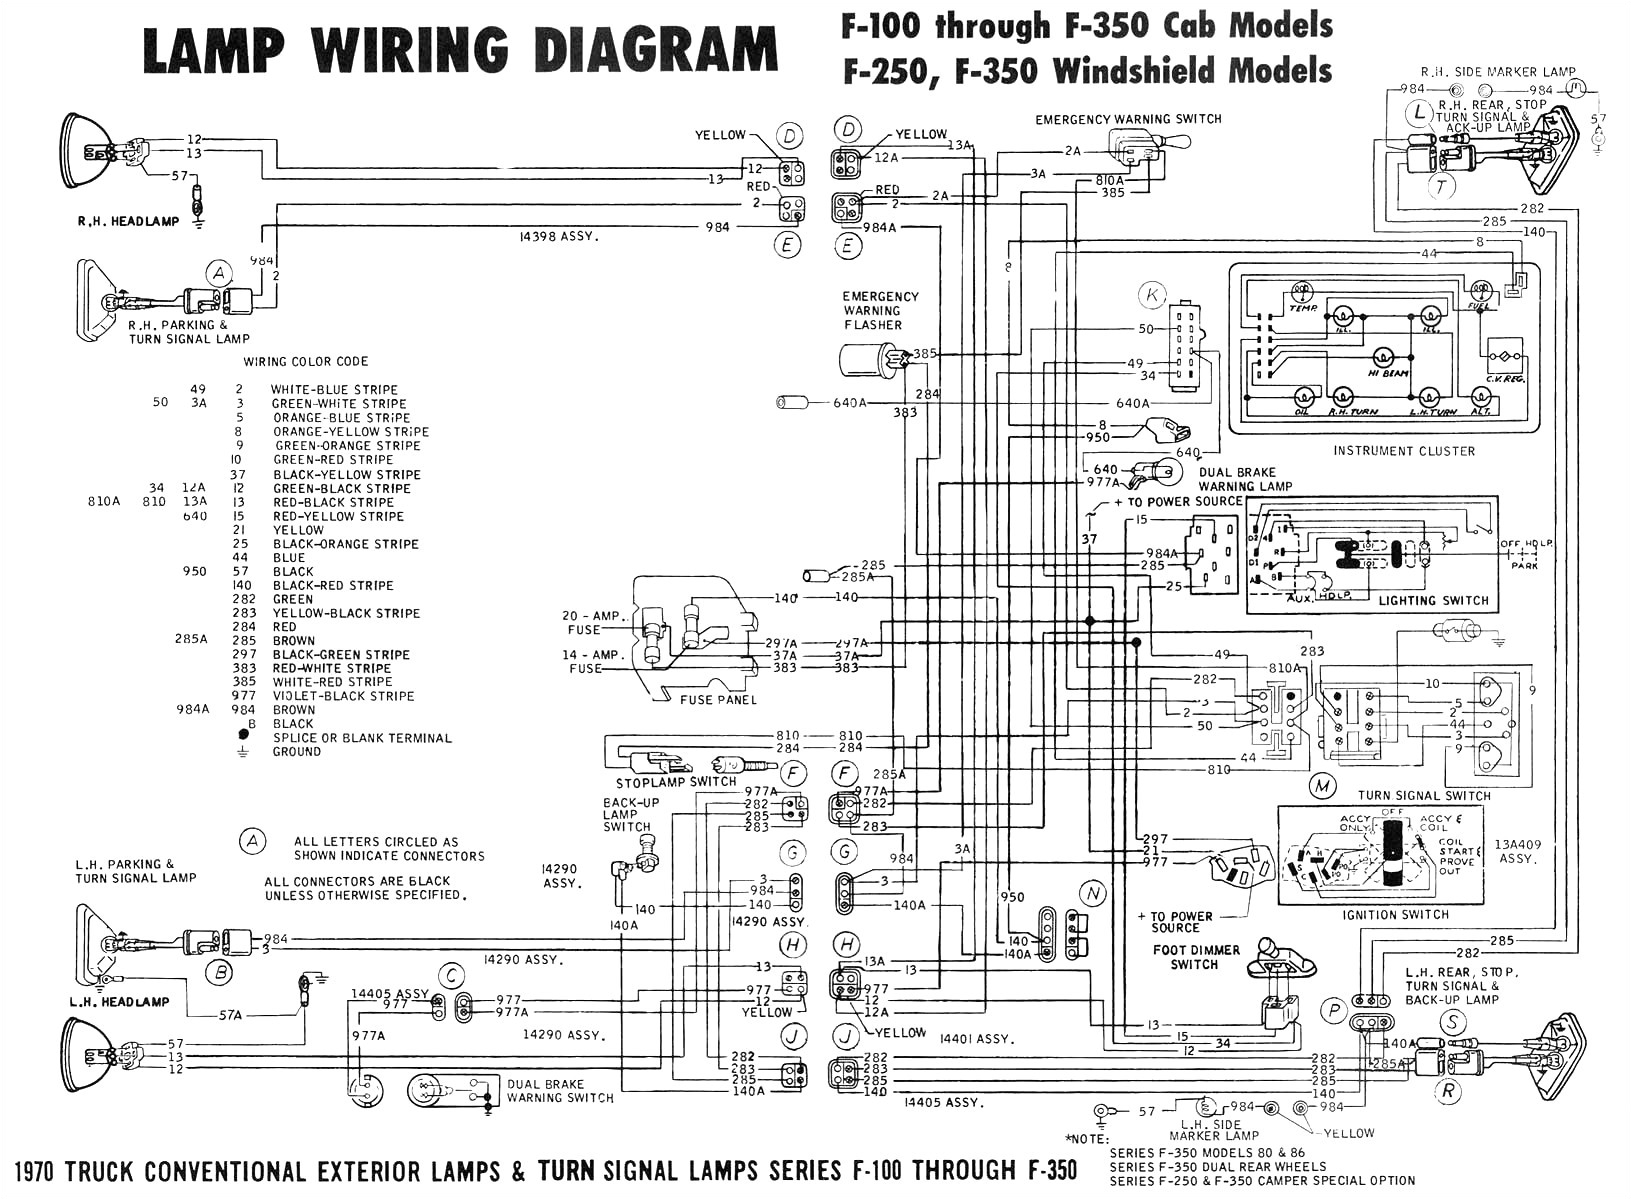 Ford F250 Trailer Wiring Diagram 2006 ford F250 Trailer Wiring Harness Wiring Diagram Schematic